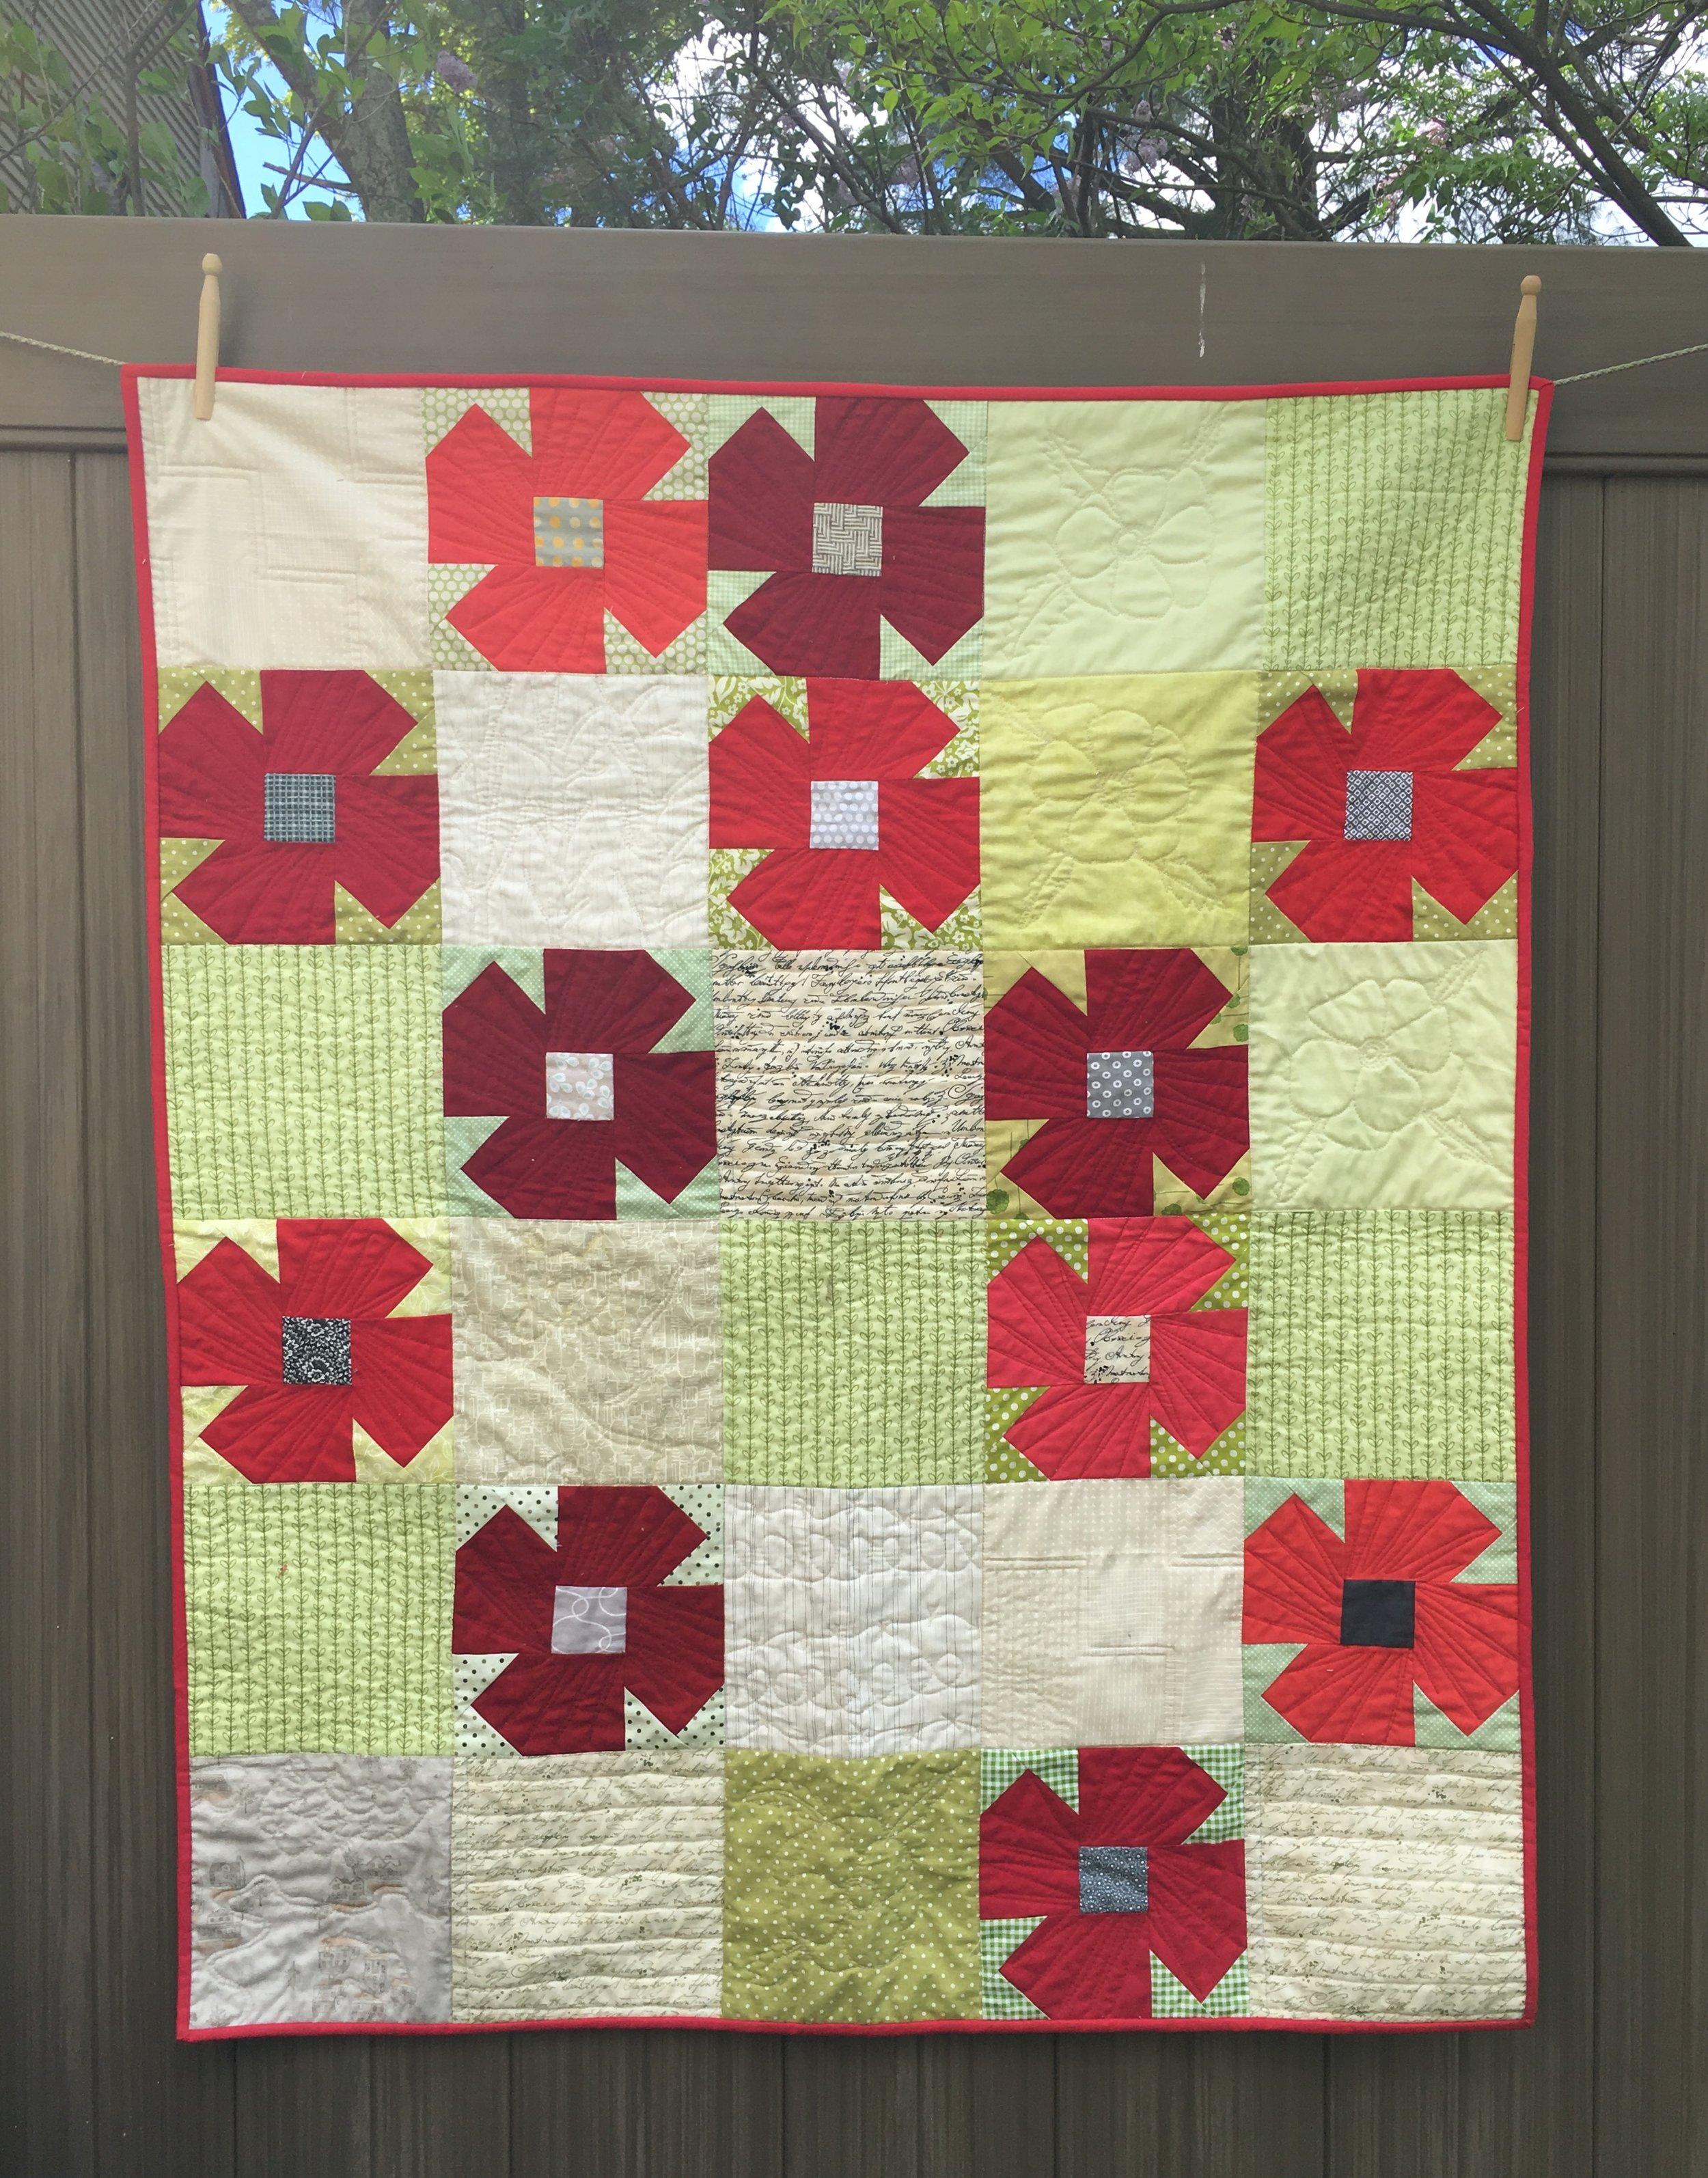 Poppy Quilt, 39.5 x 47 inches